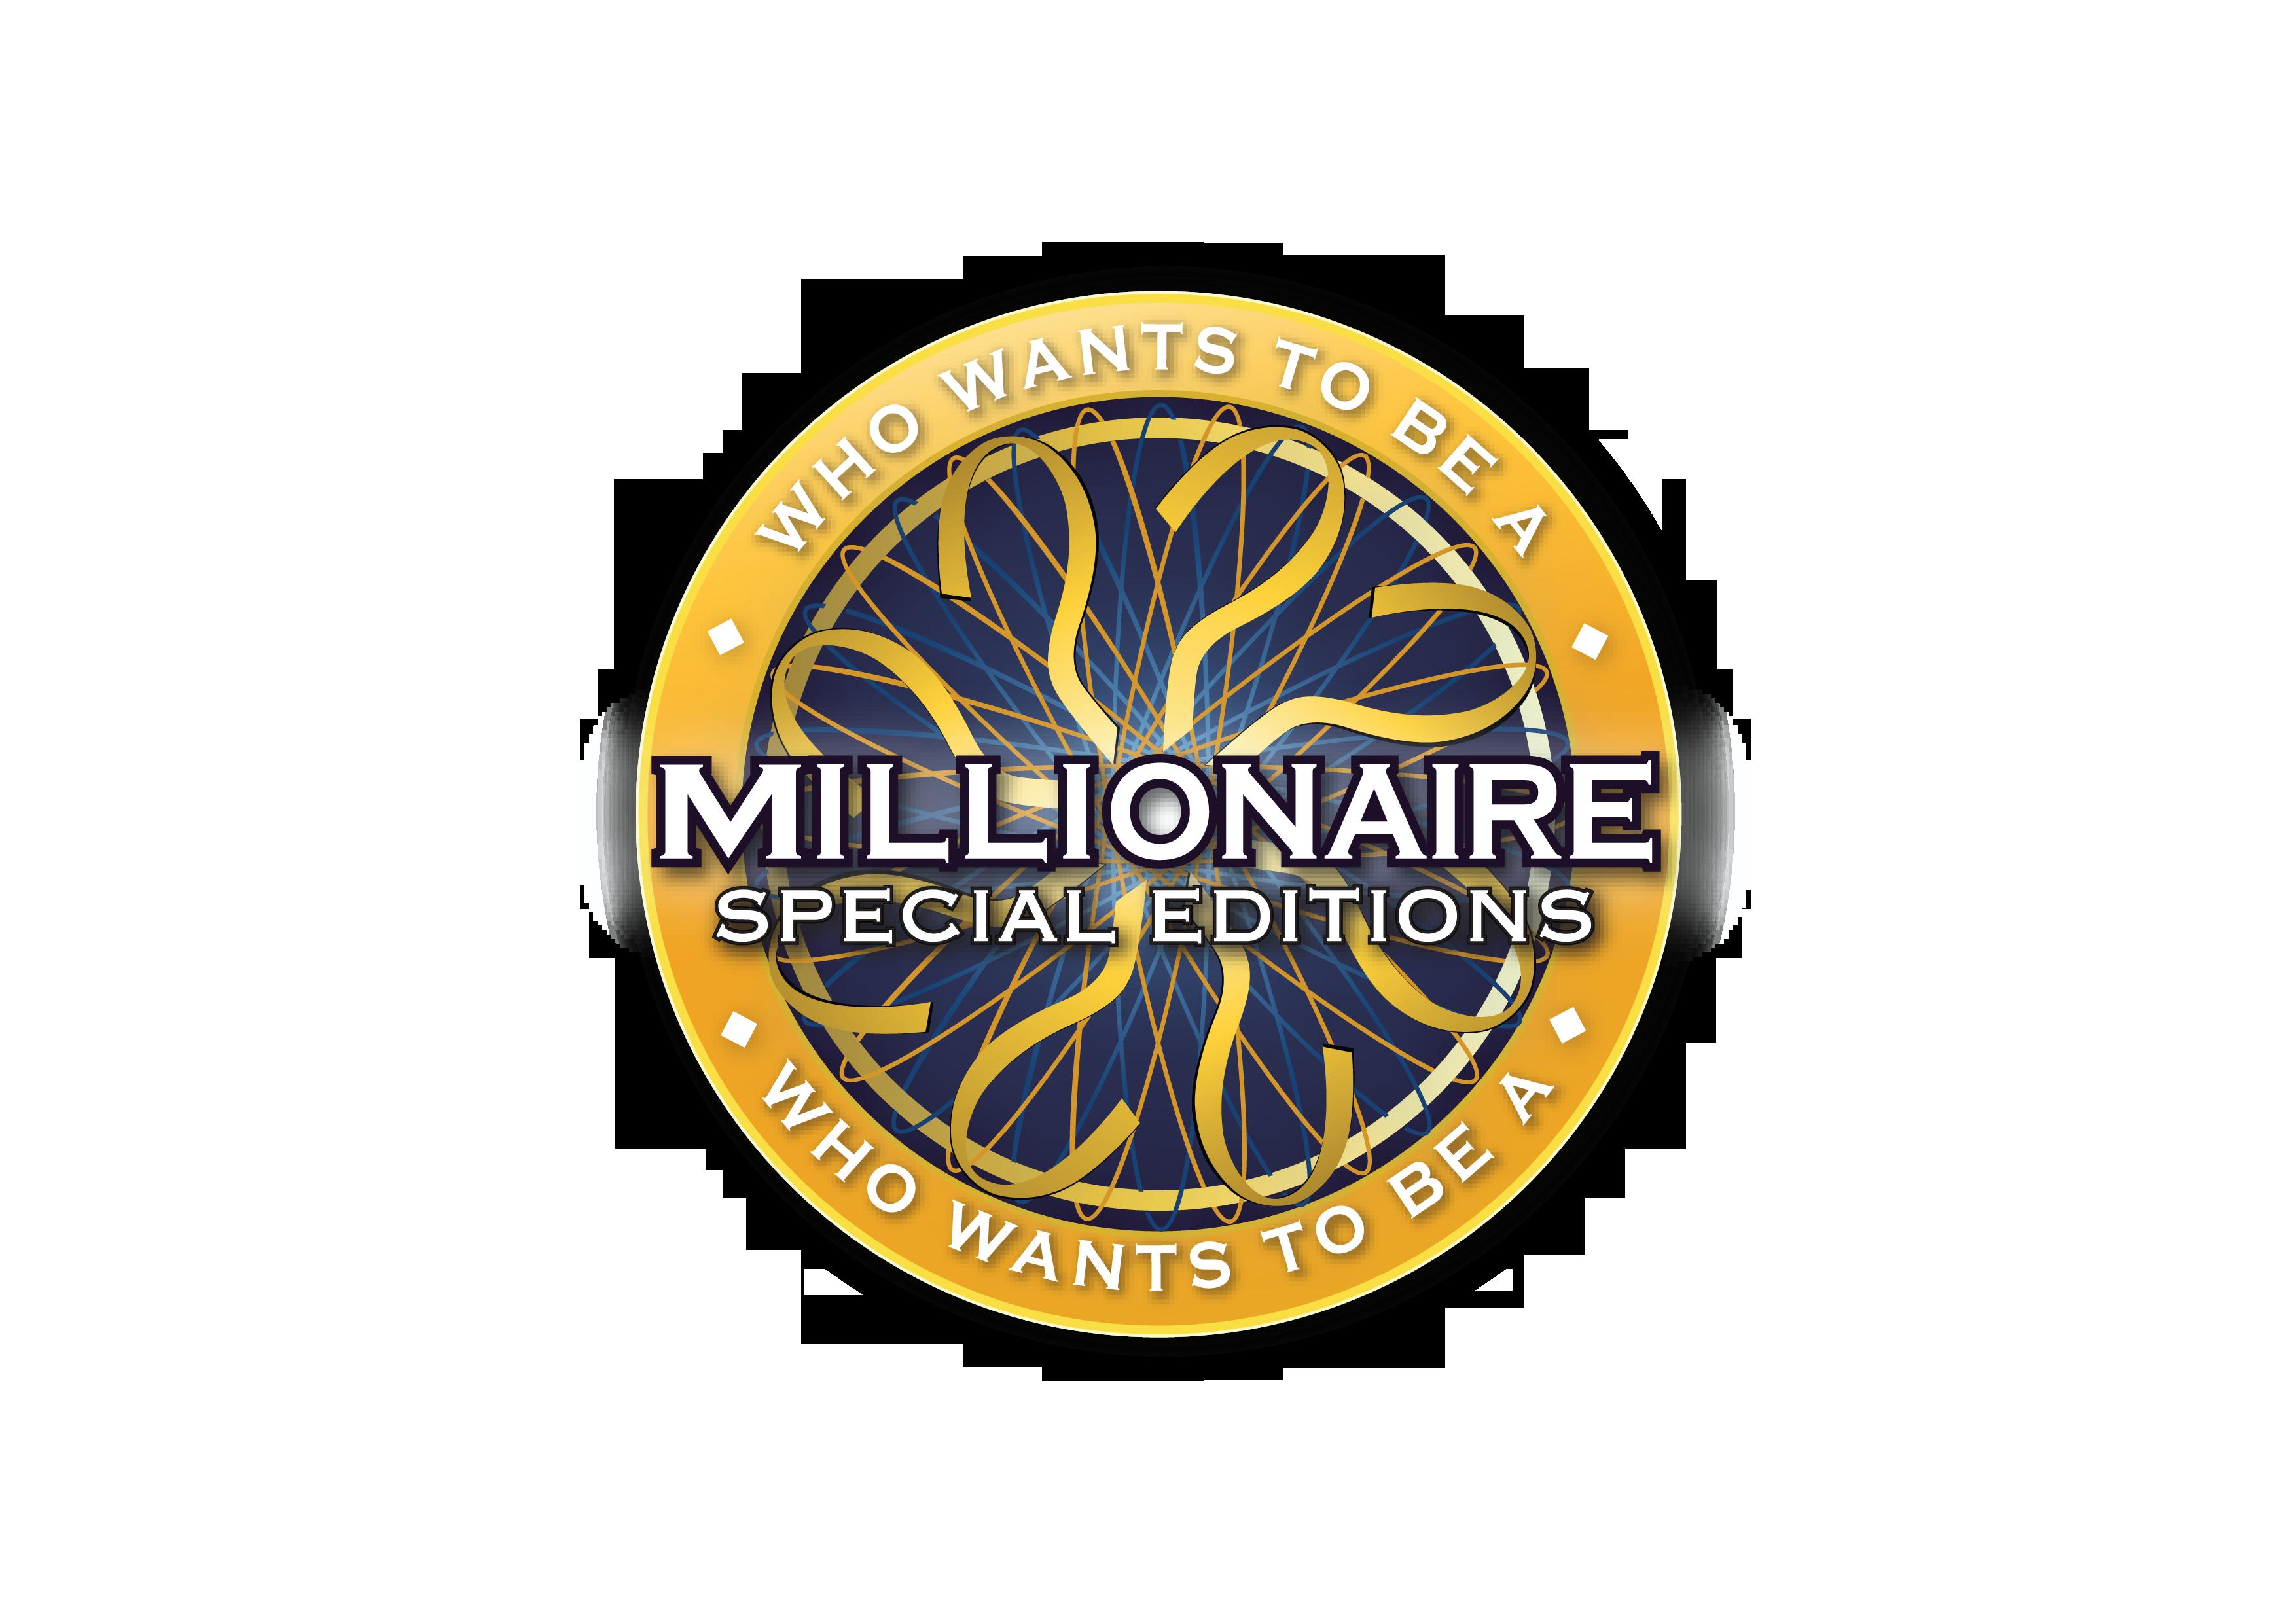 Final_WWTBAM_logos_lang_En.png - PNG Millionaire